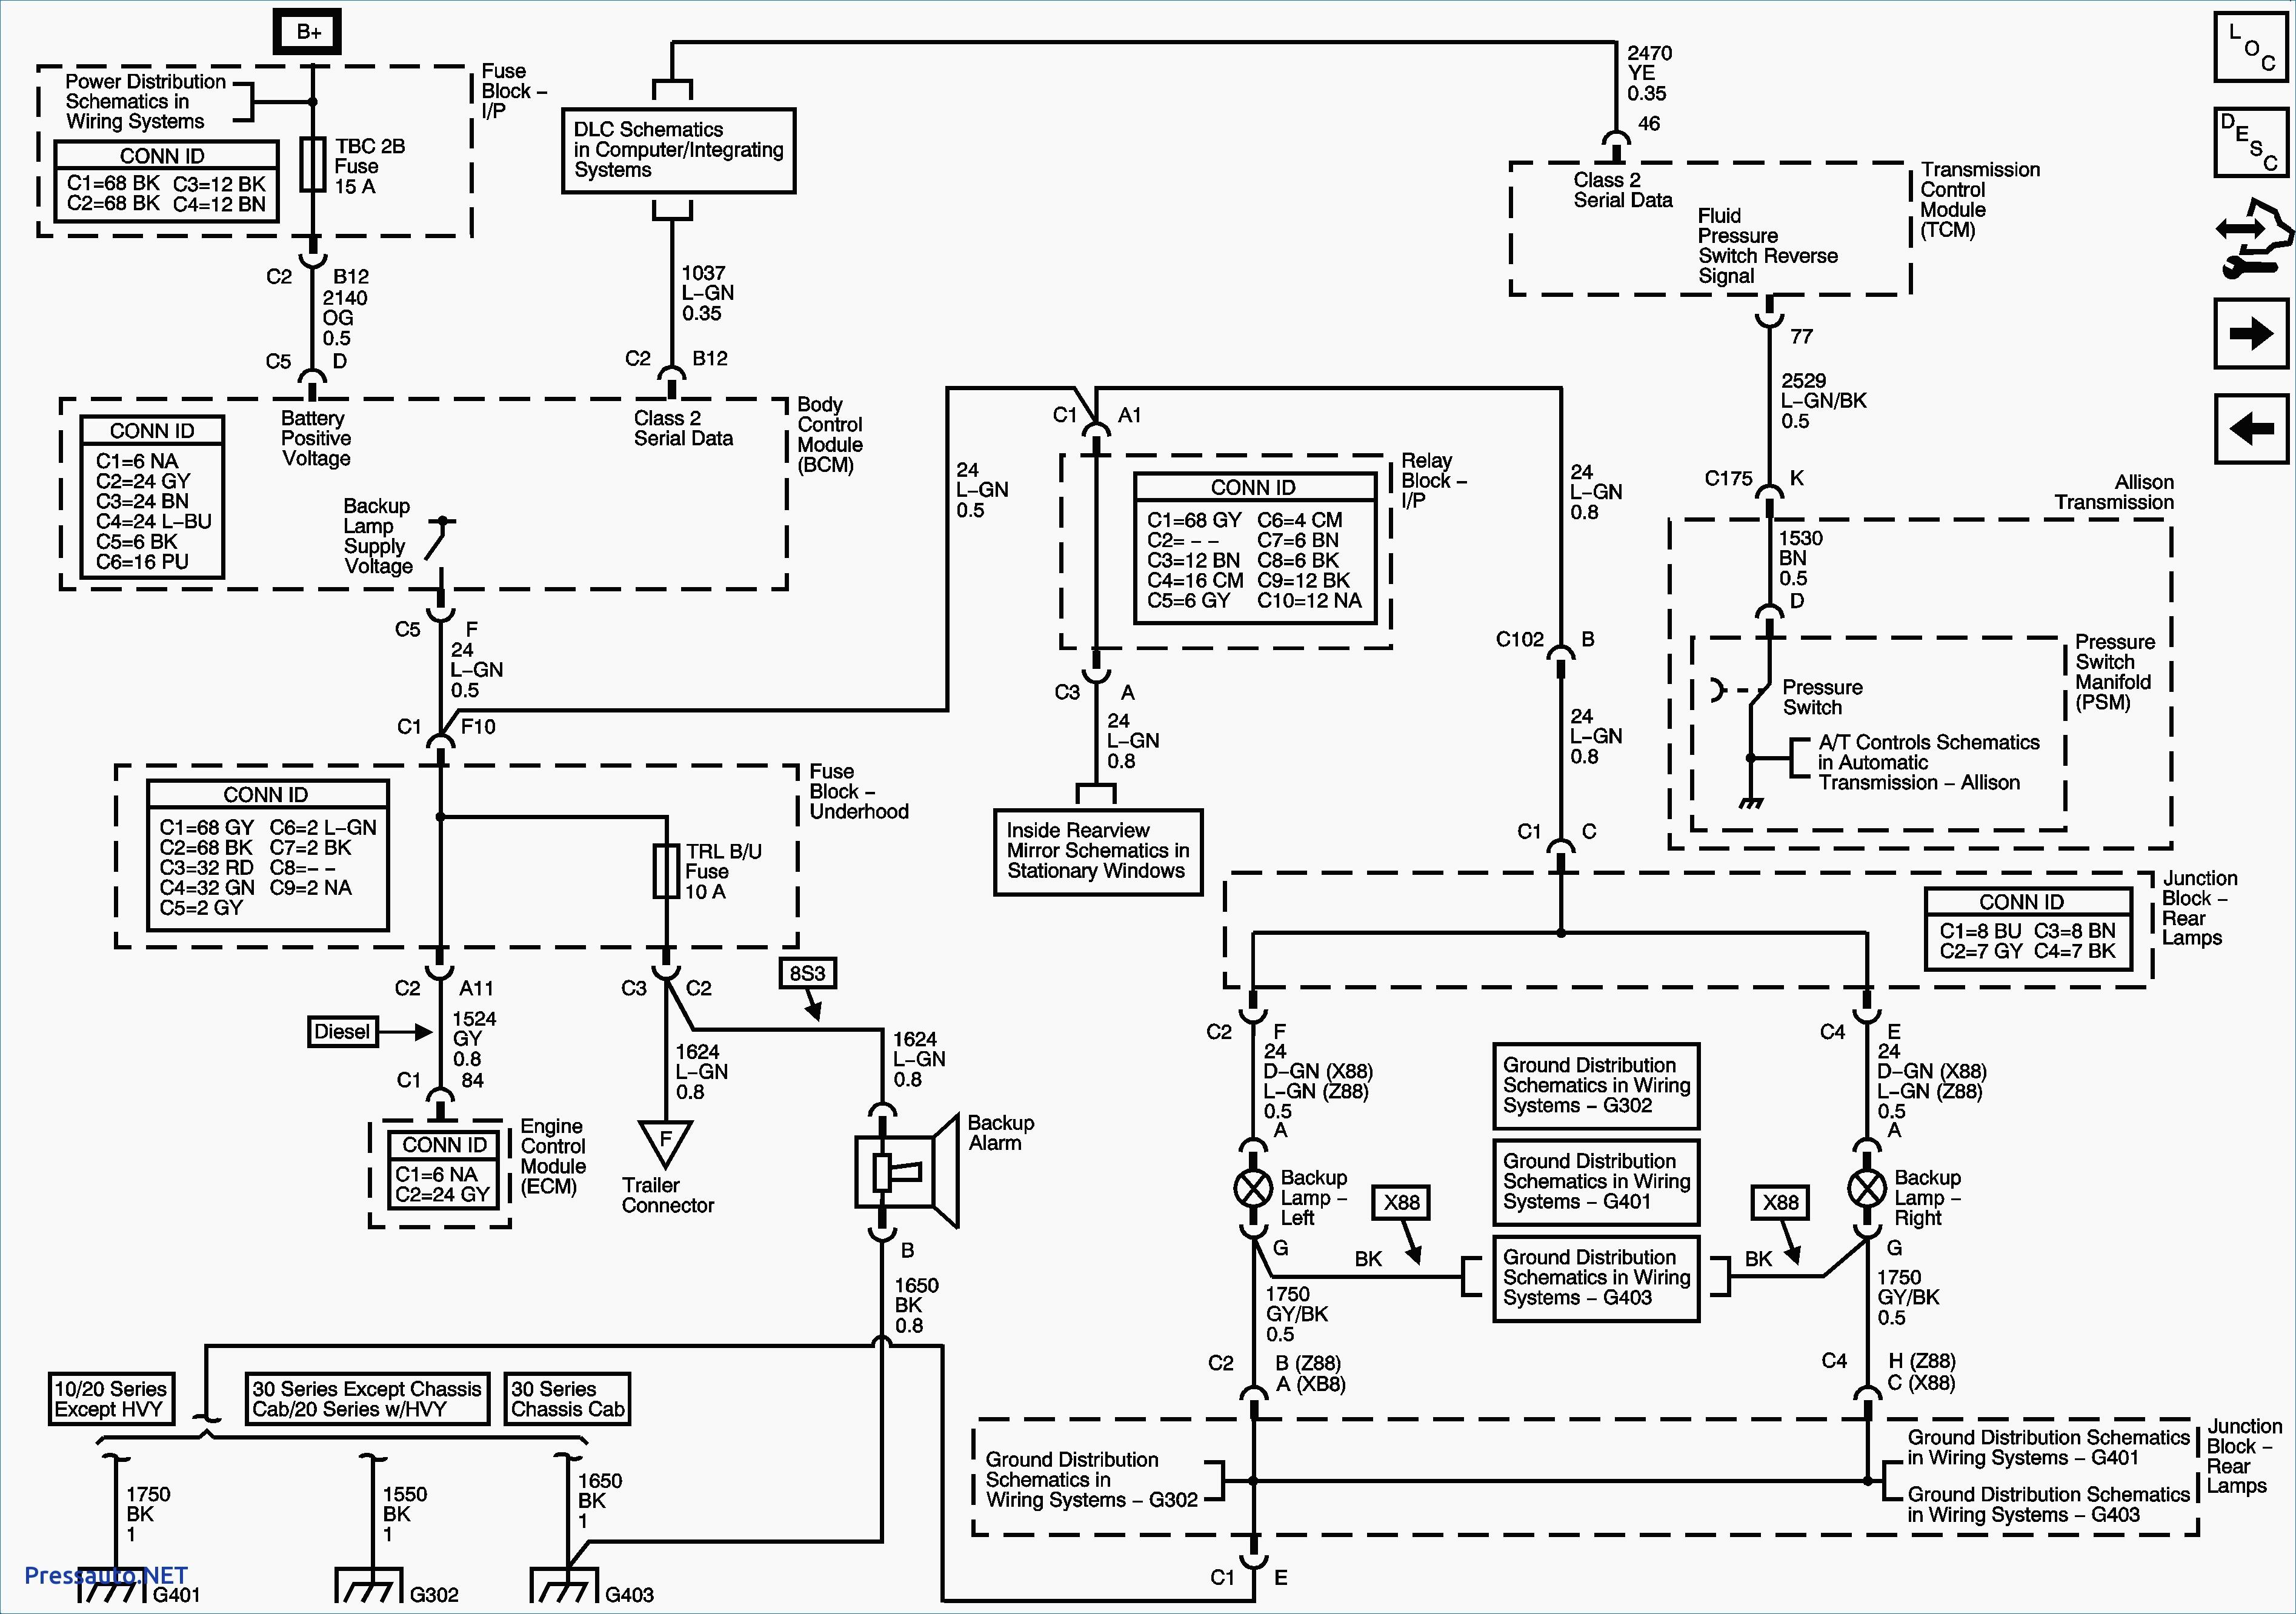 2003 Chevrolet Tail Light Wiring Diagrams Trailblazer Diagram For Chevy Silverado